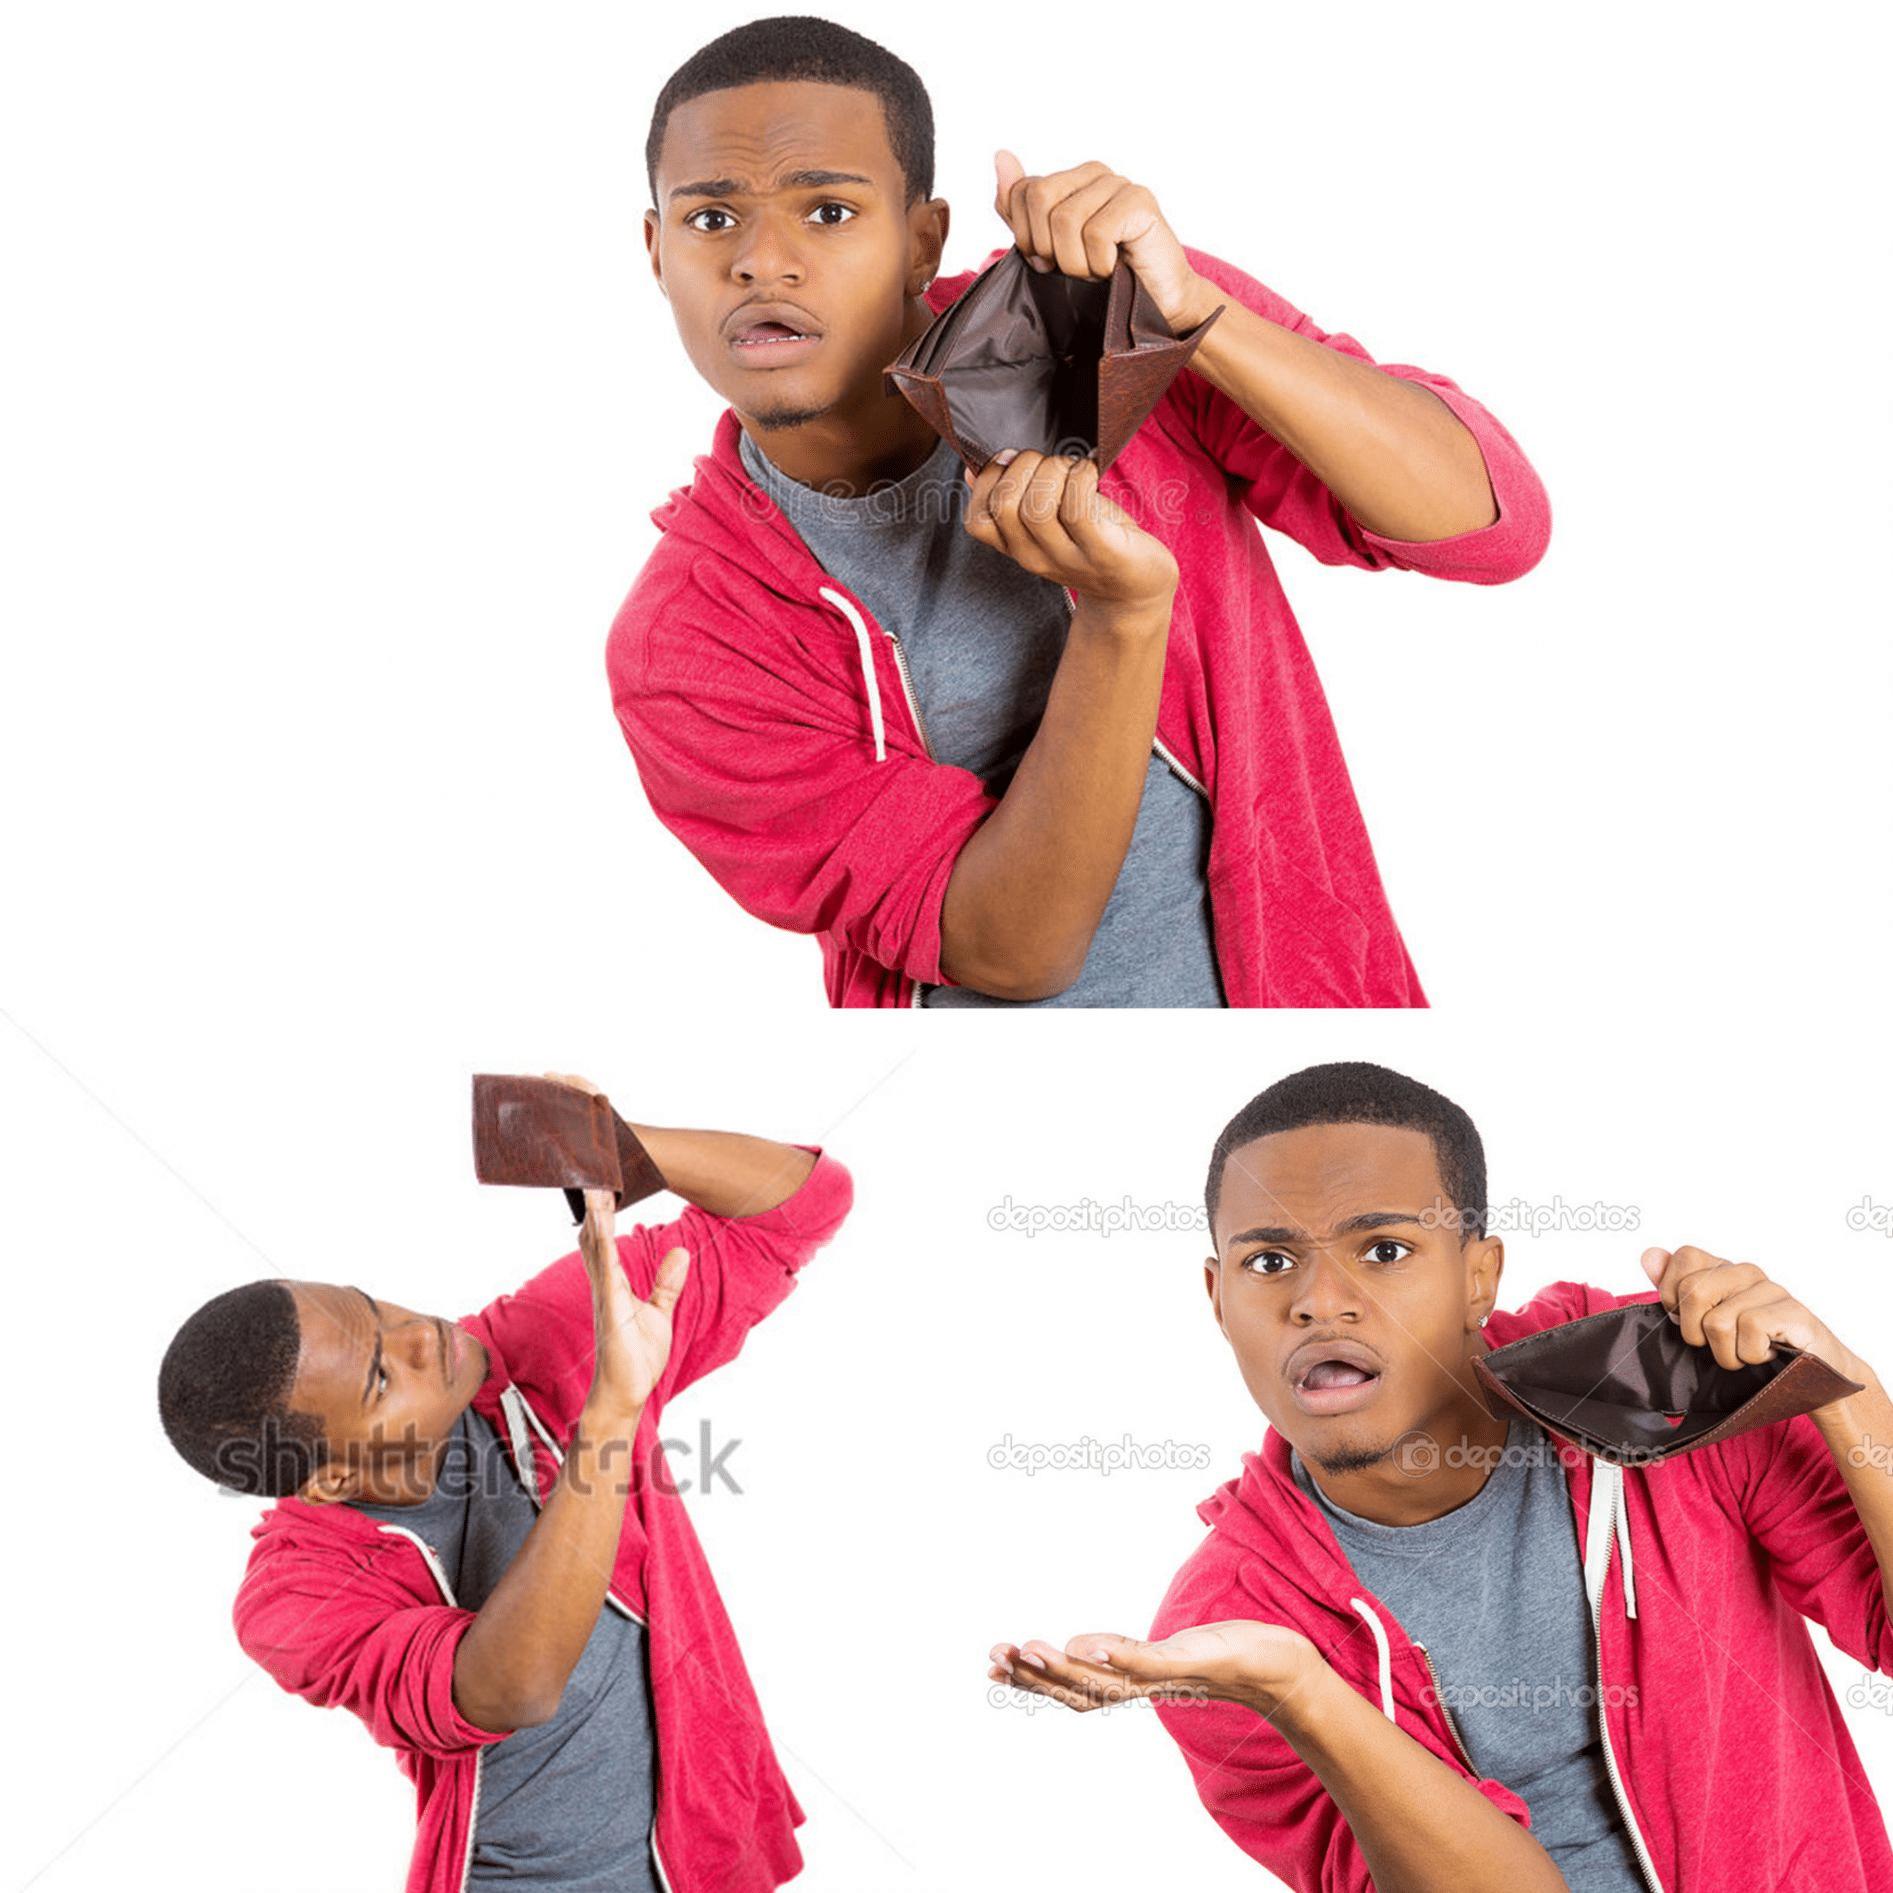 Meme Generator - Black Guy Empty Wallet - Newfa Stuff